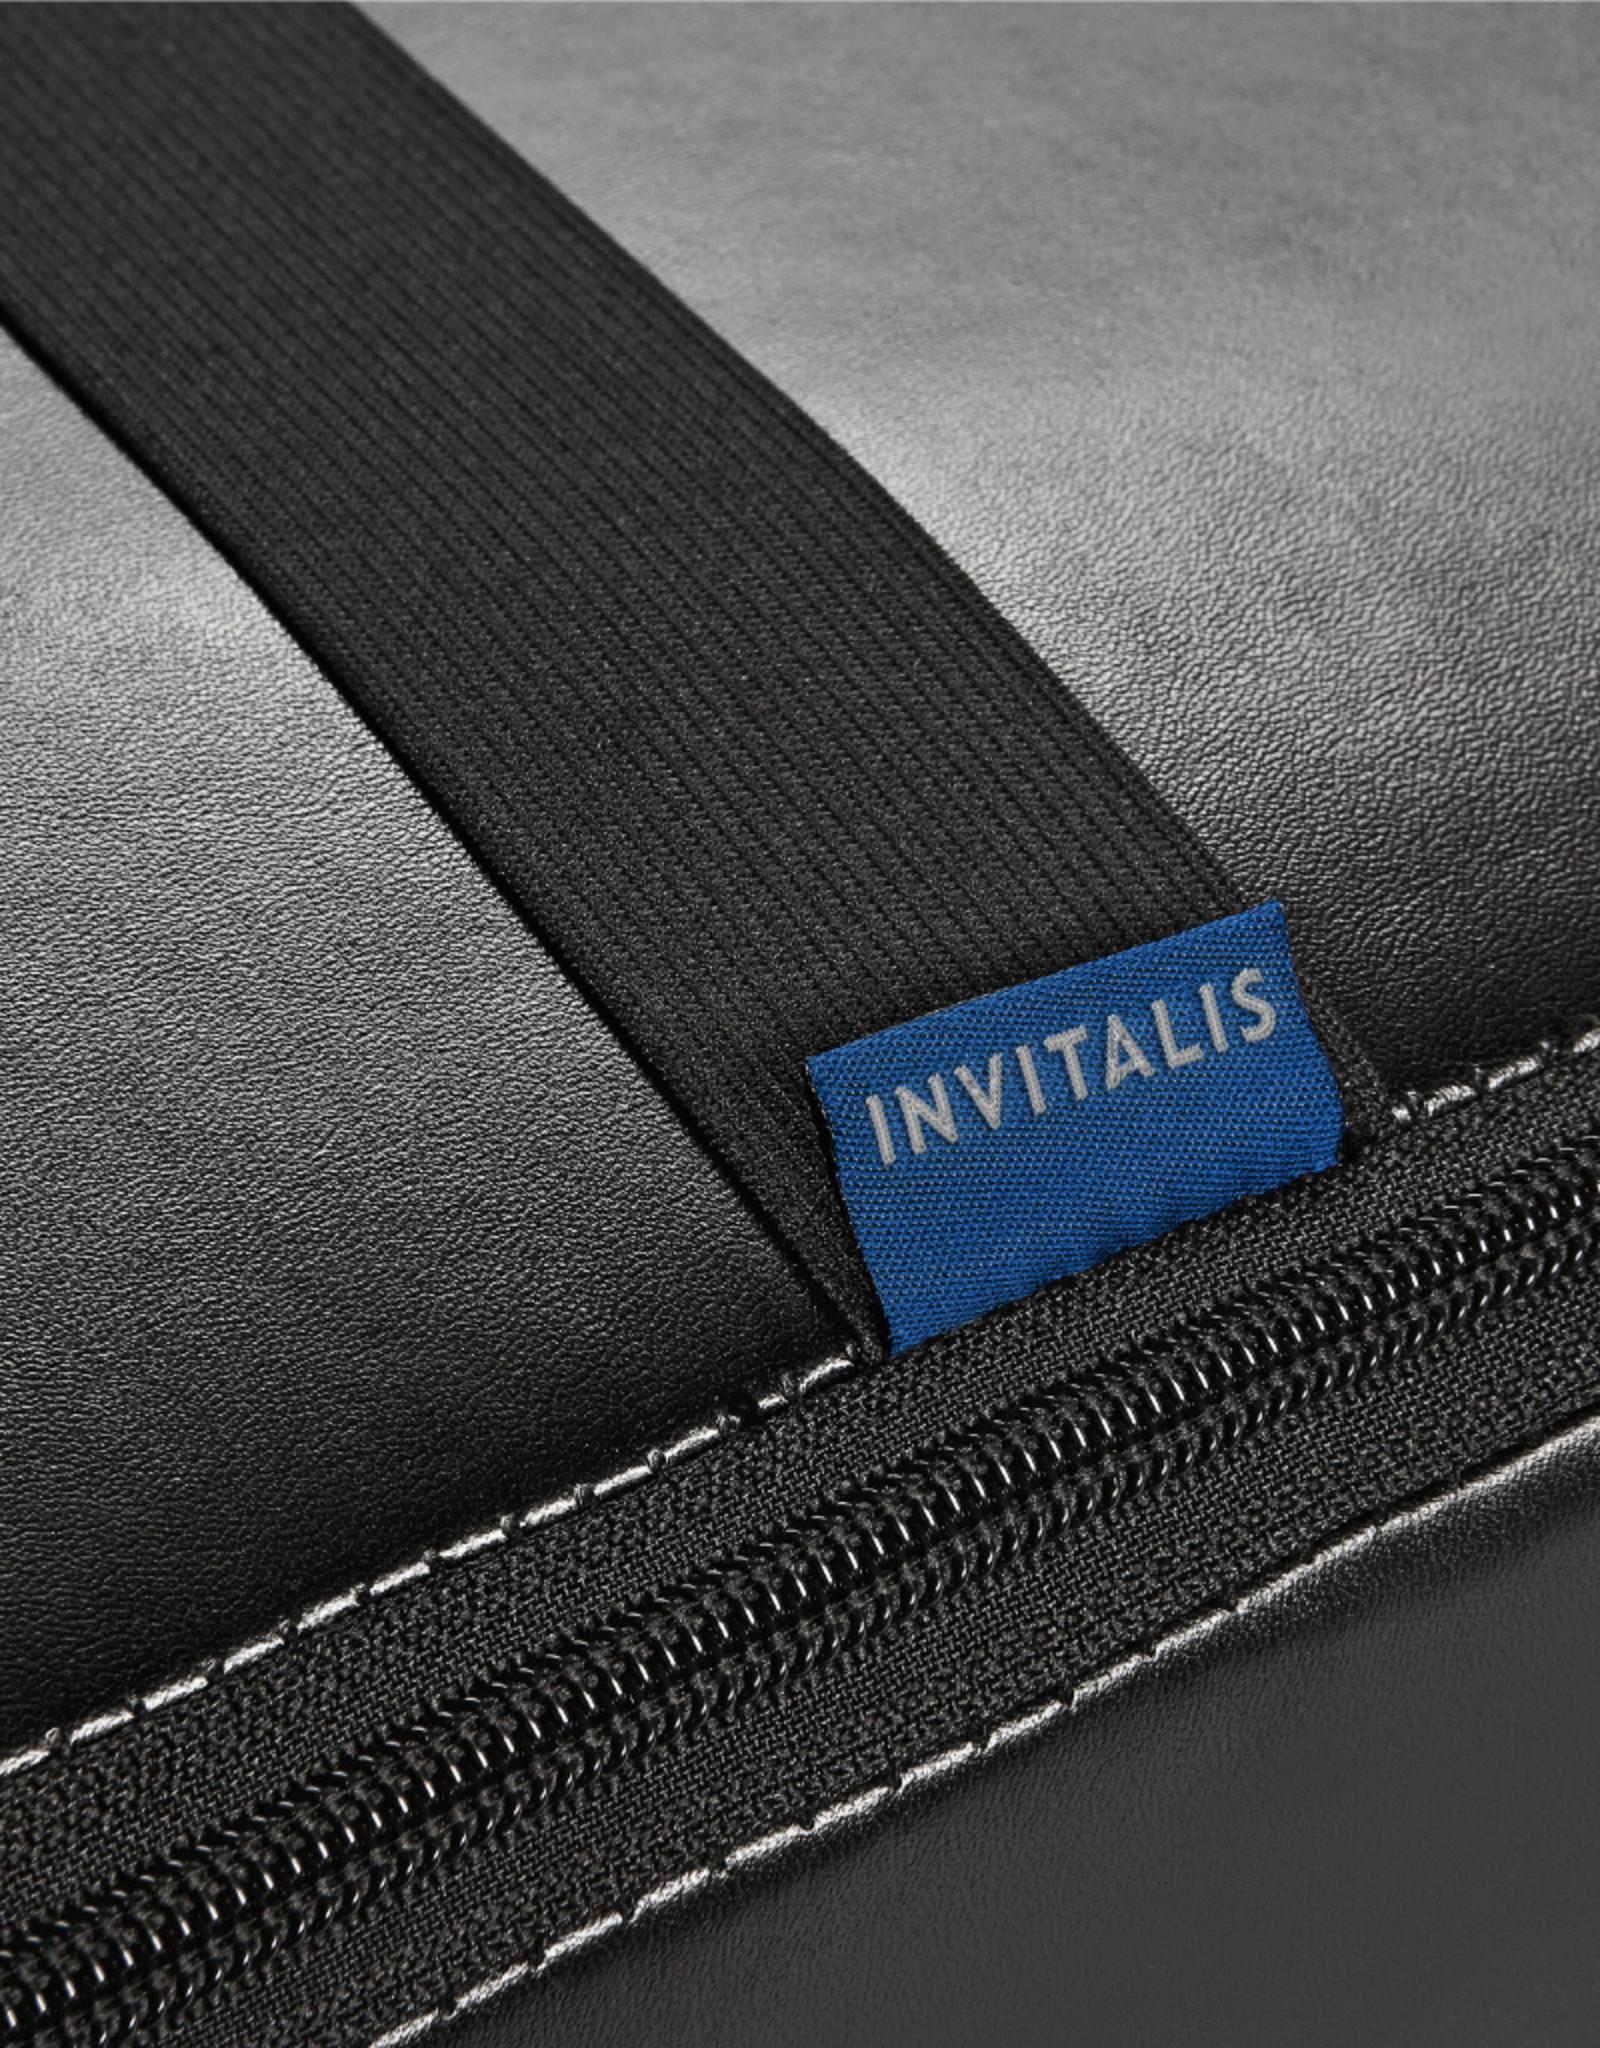 INVITALIS Vitalymed Plus - Schwarz